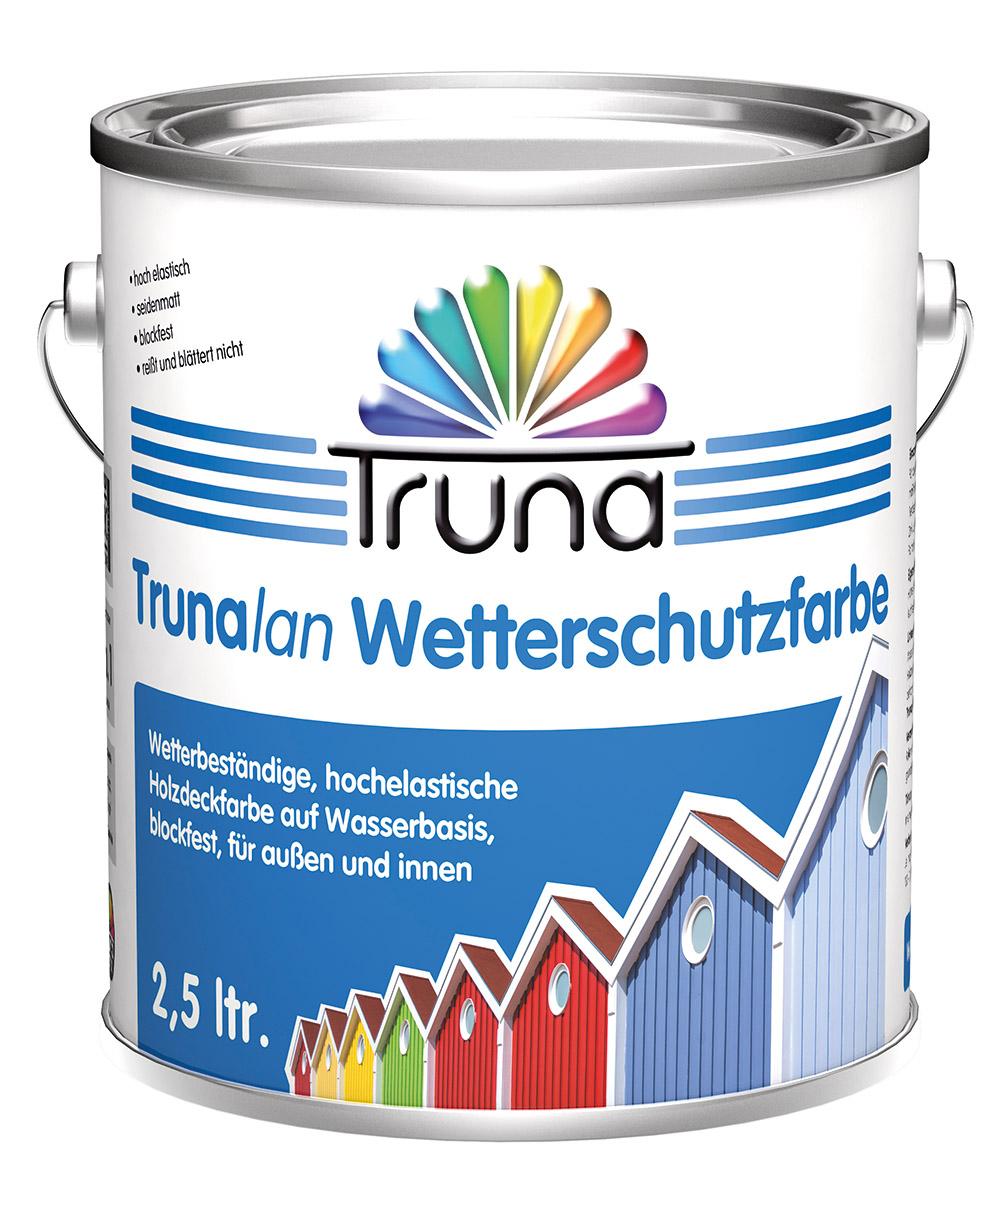 Trunalan_Wetterschutzfarbe_2,5l